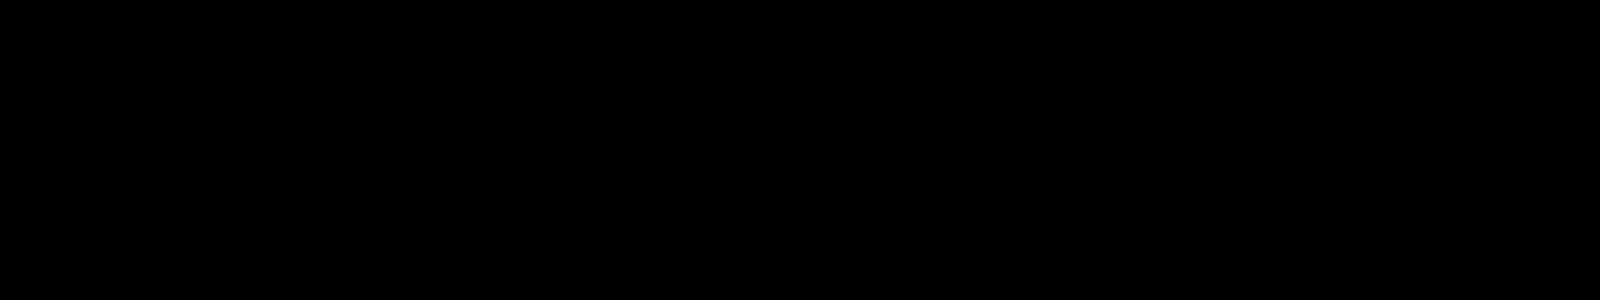 polkadot